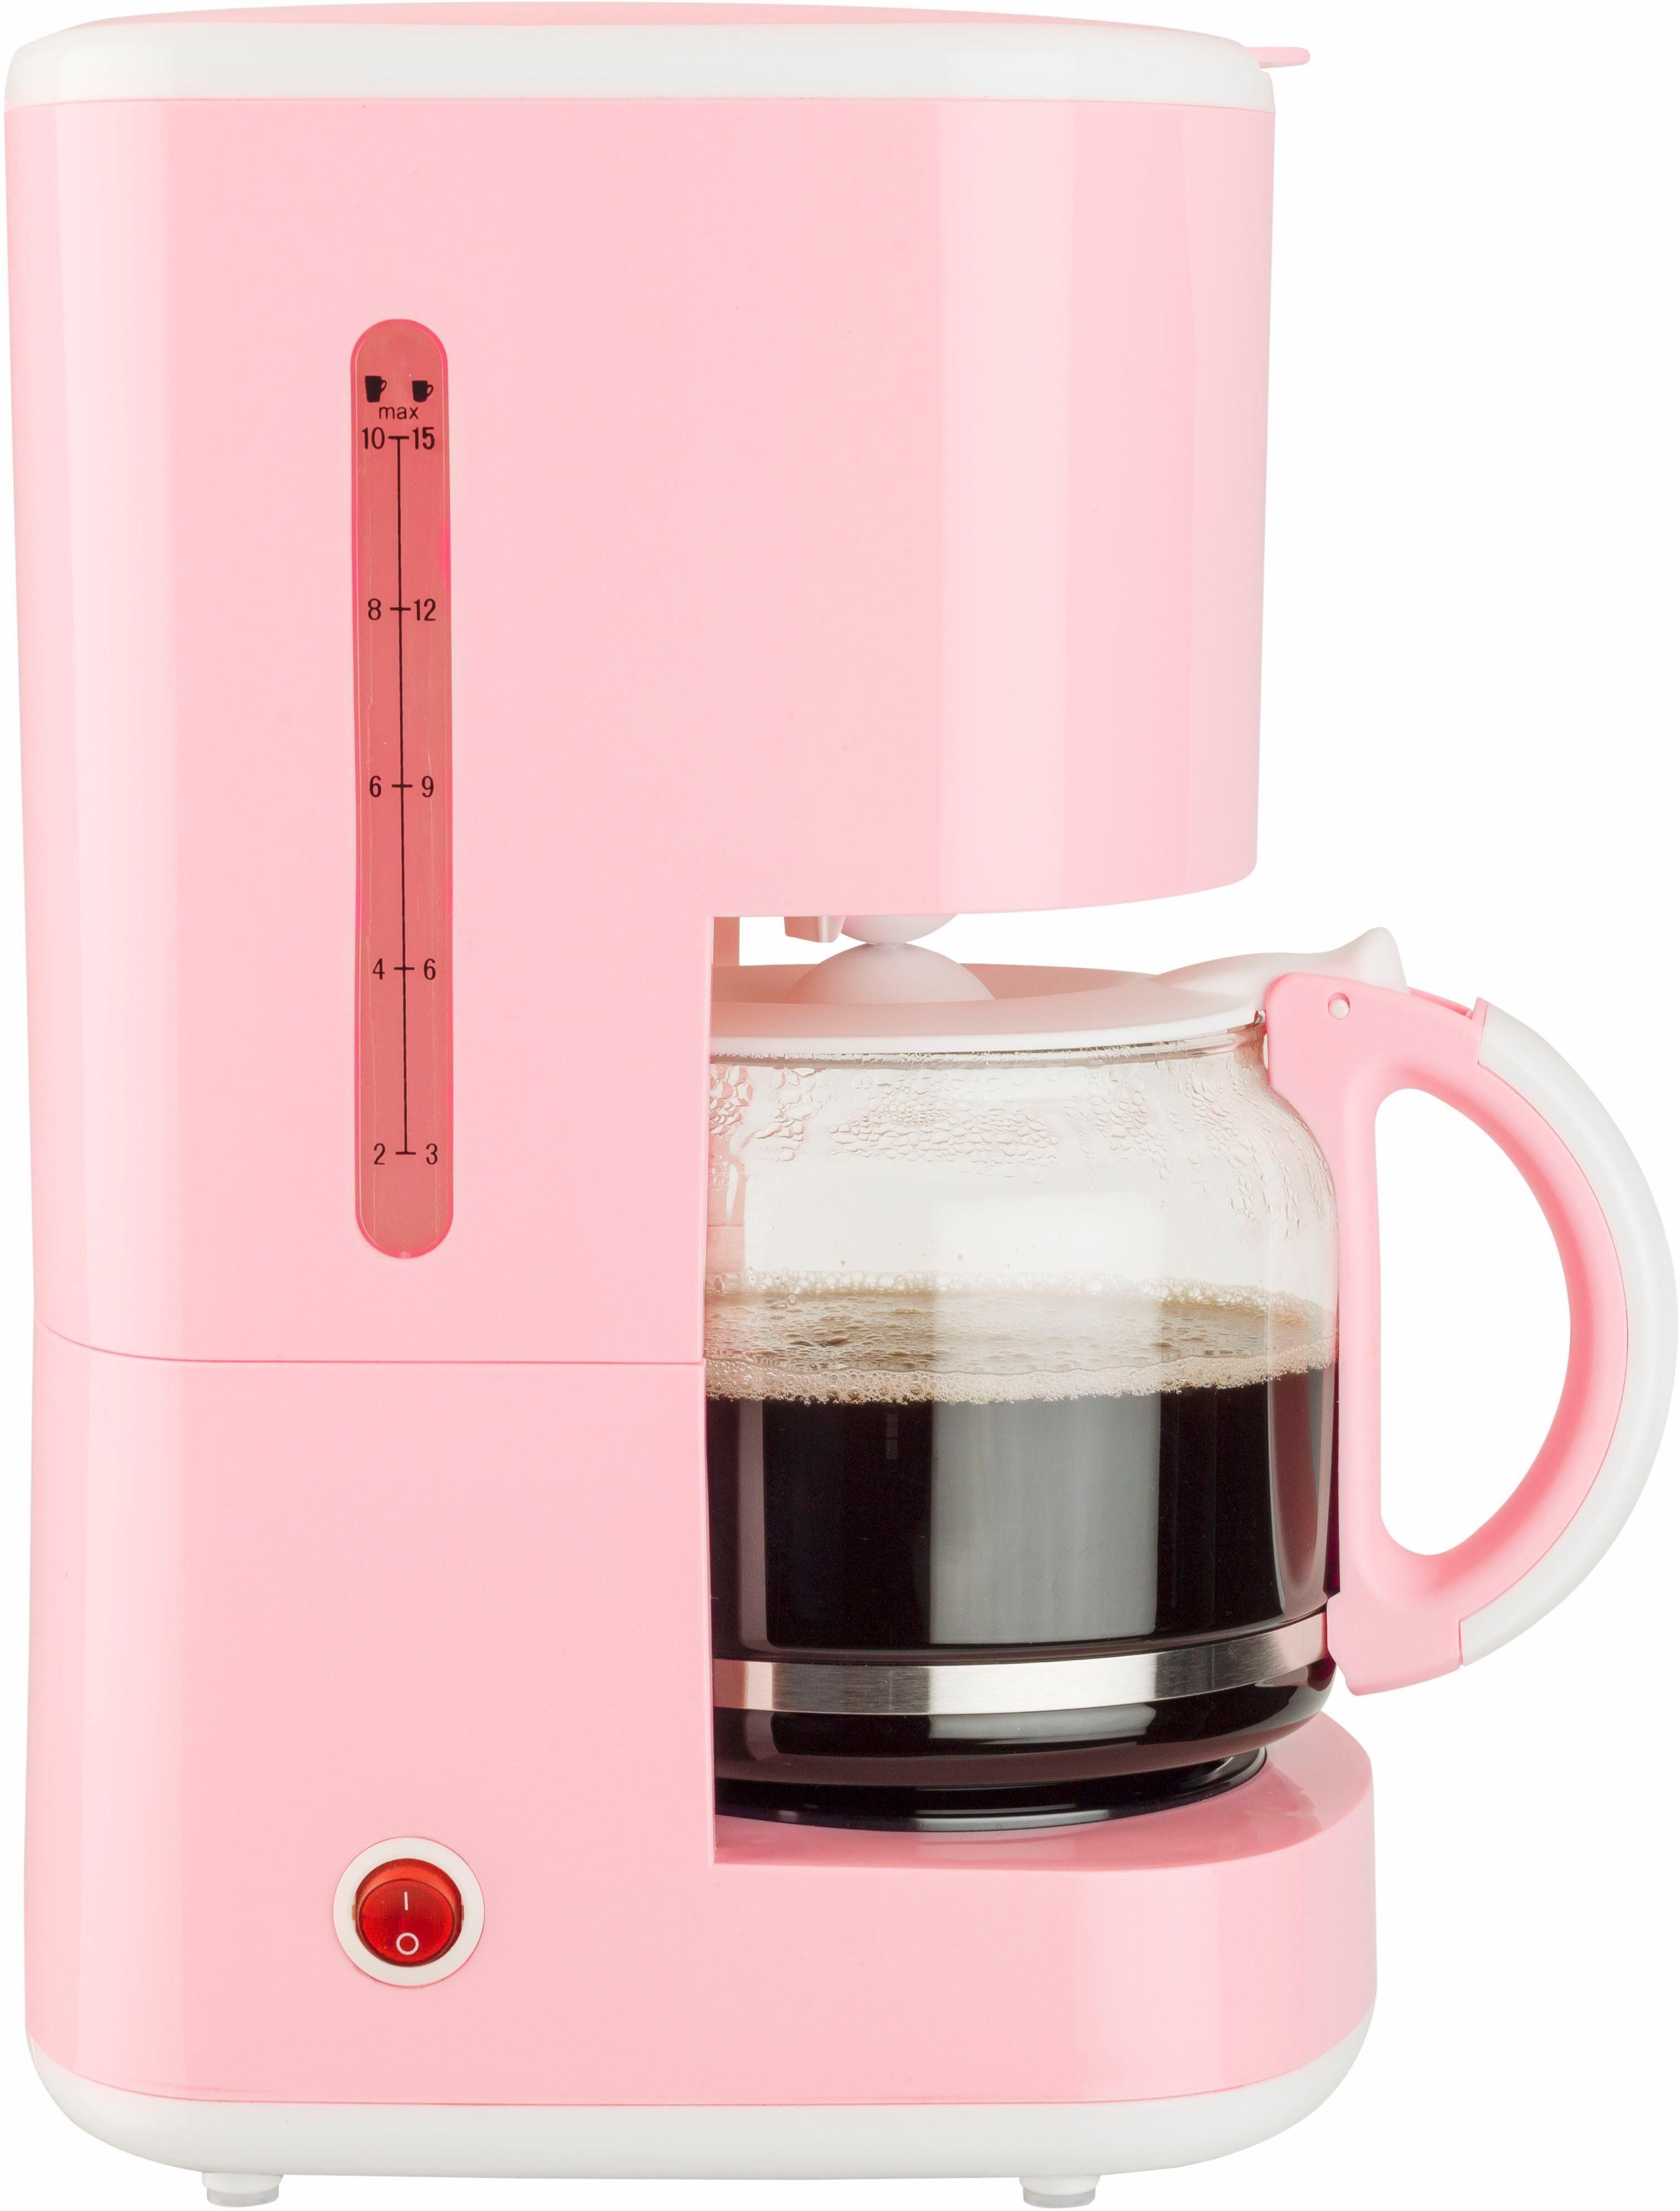 bestron Filterkaffeemaschine ACM300EVP, 1,5l Kaffeekanne, Permanentfilter 1x4